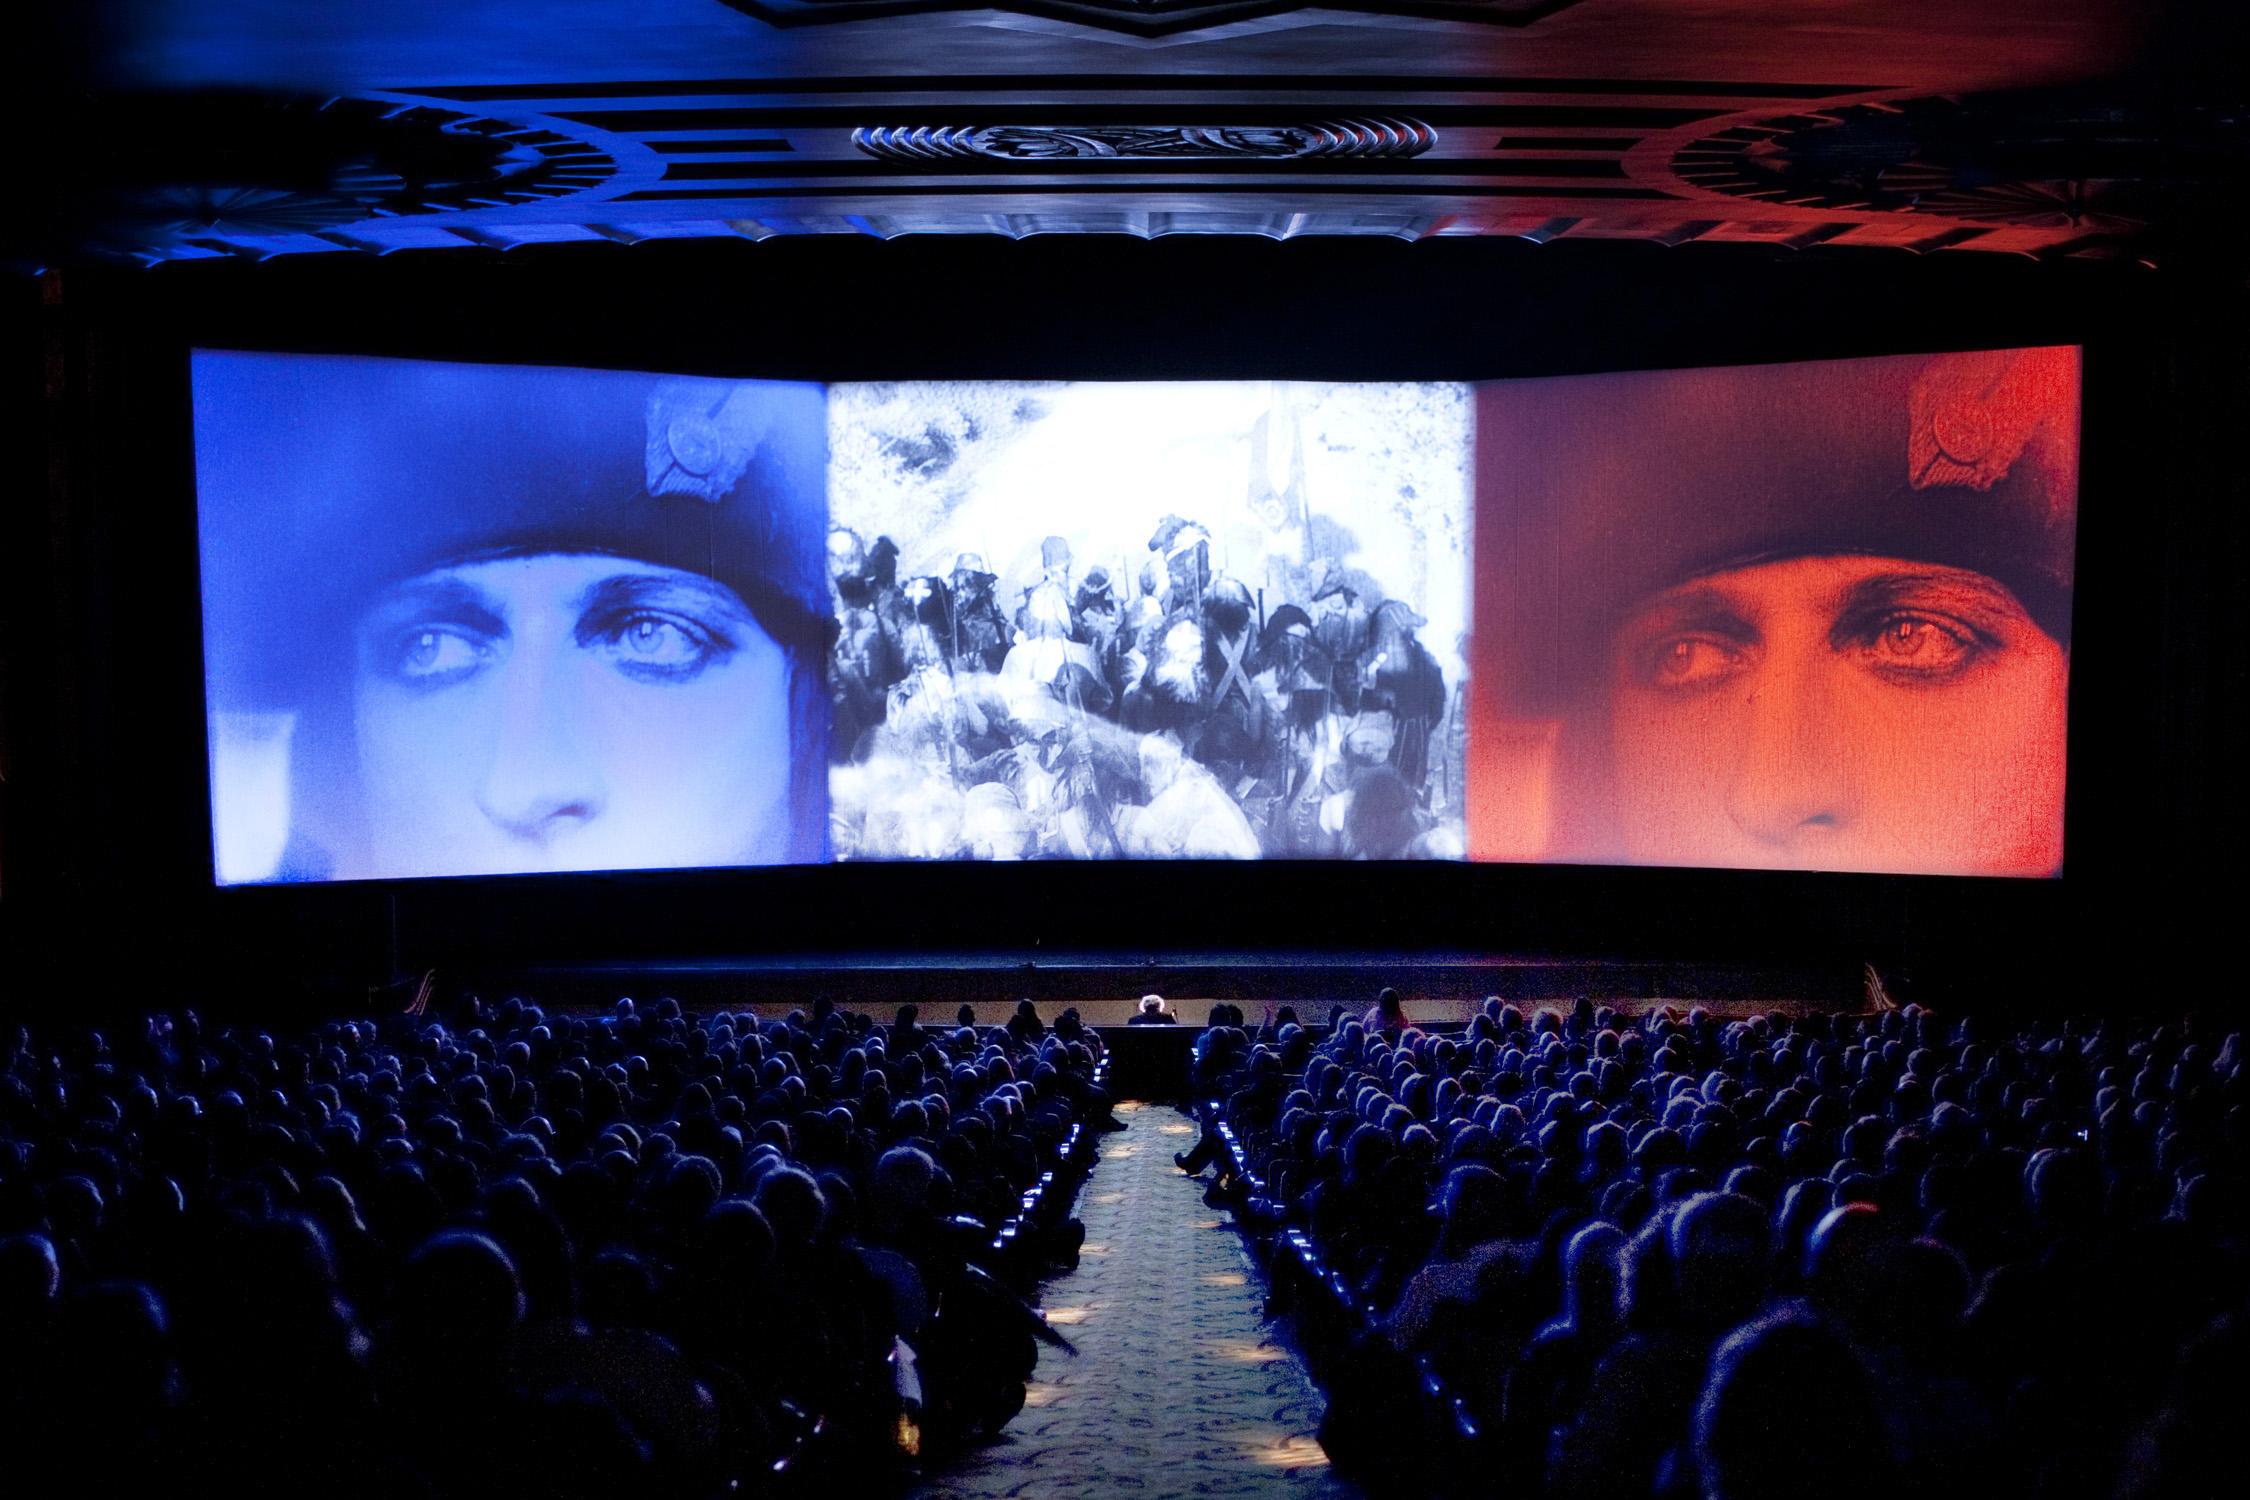 Abel Gance's  Napoléon  at the Paramount Theatre Oakland, 2012. (Photo by Pamela Gentile, courtesy of San Francisco Silent Film Festival.)